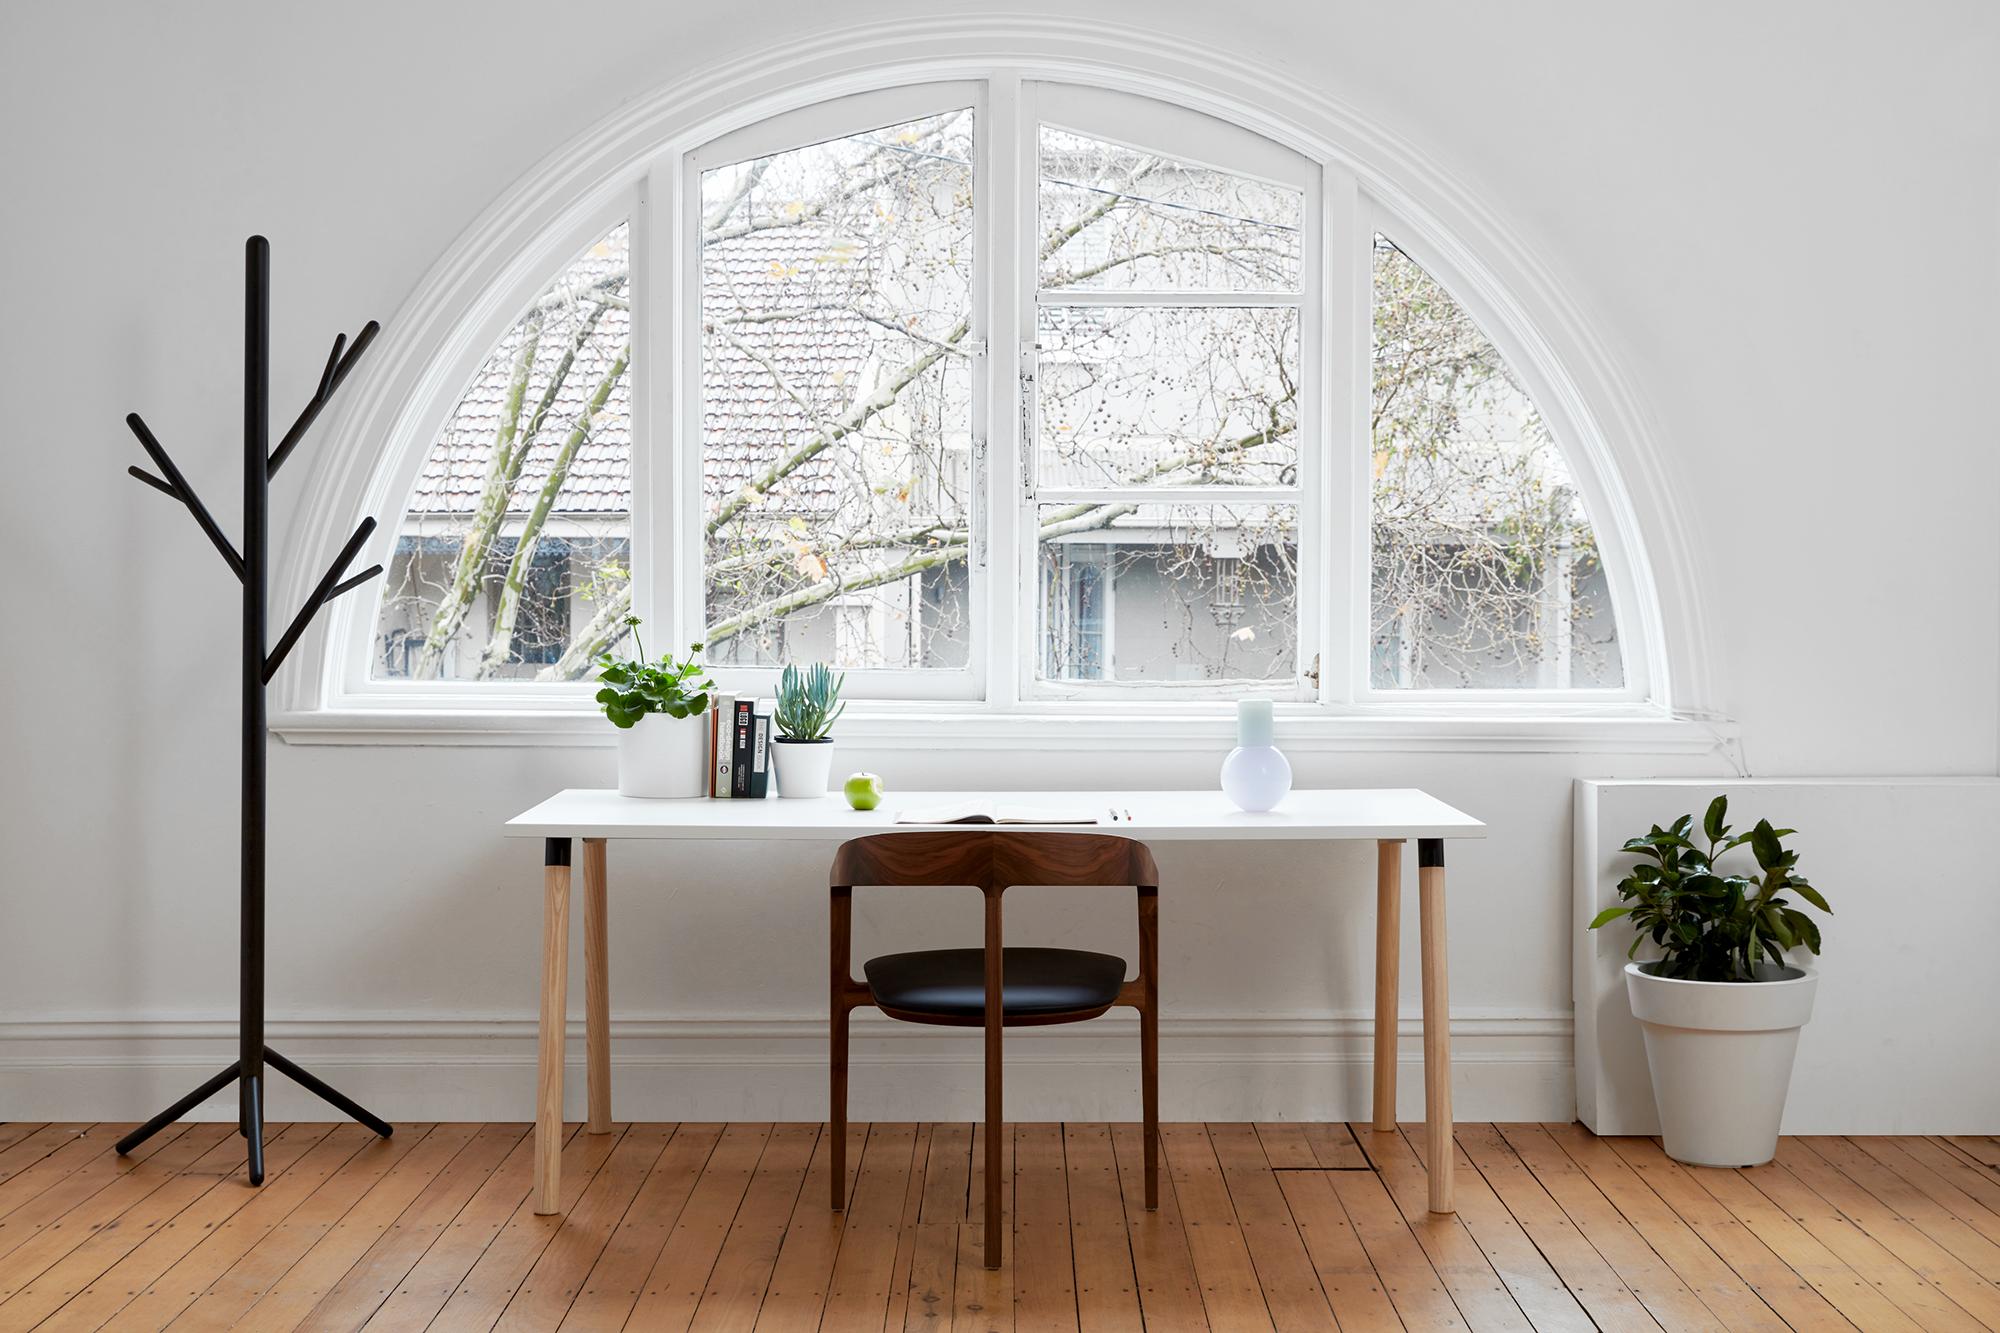 Partridge Desk Bedside Table Design Timber Furniture Chair